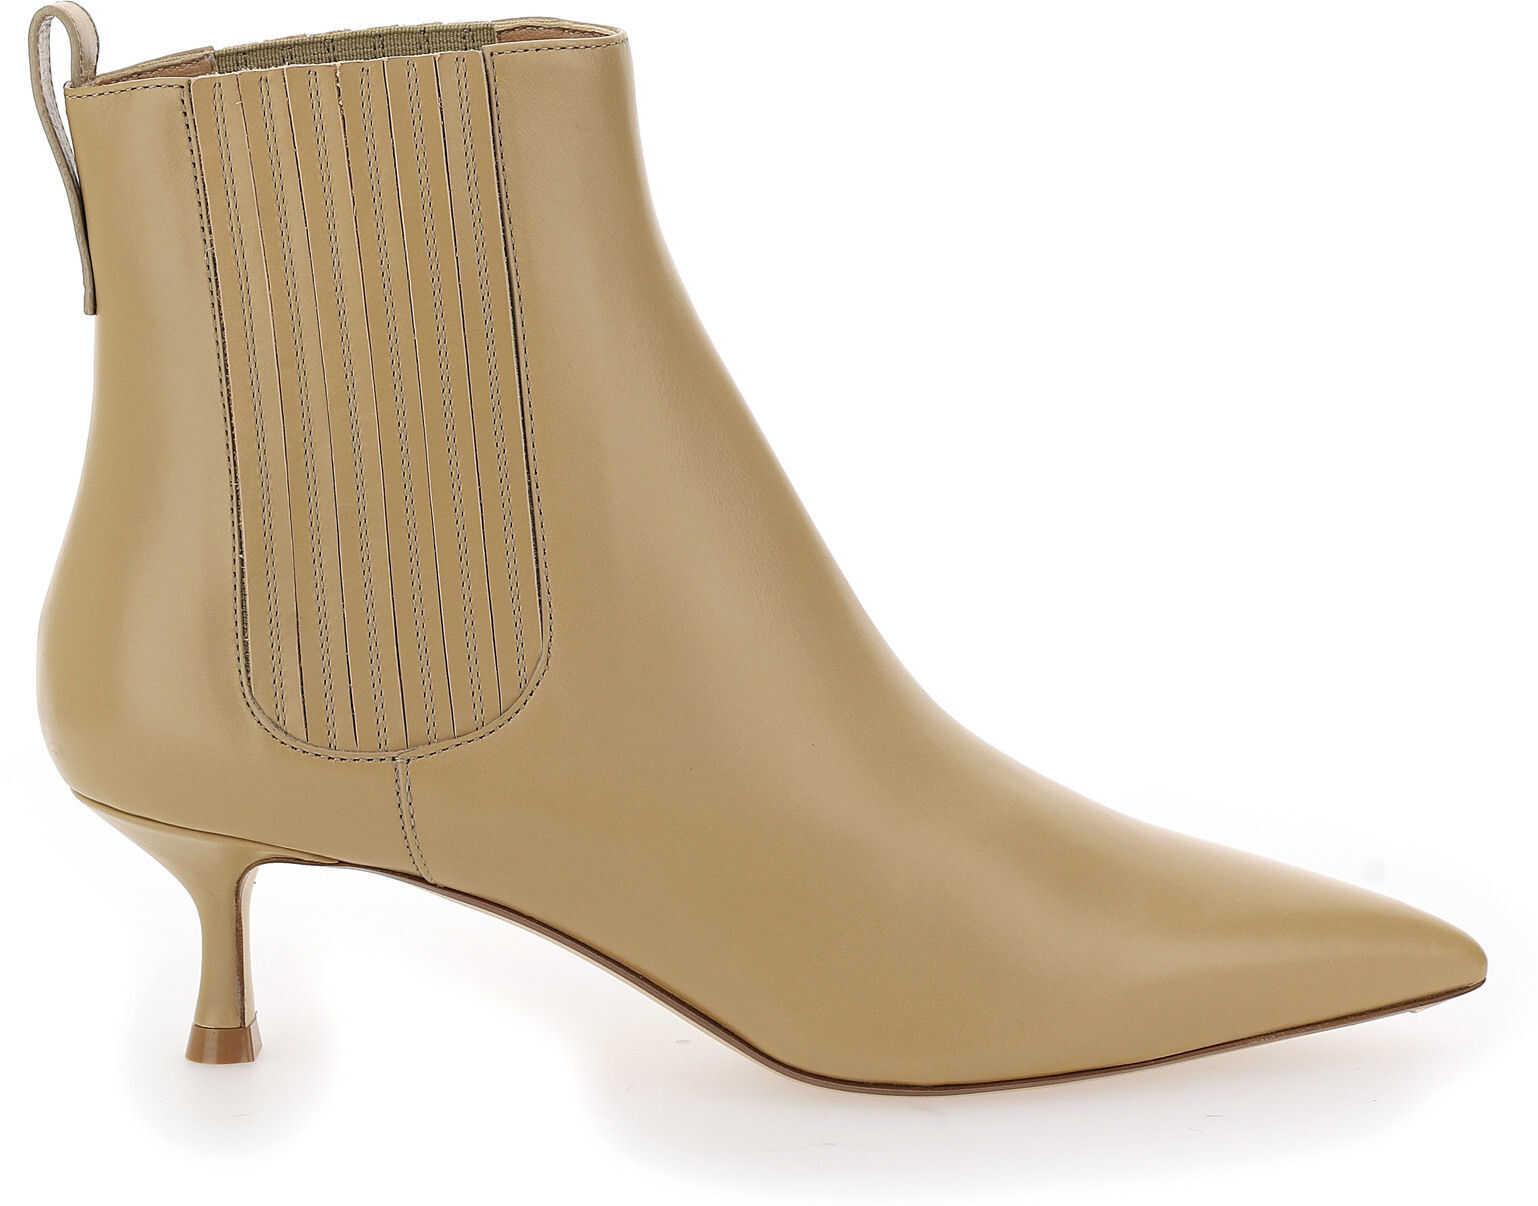 Francesco Russo Boots FR35001A12002 BEIGE imagine b-mall.ro